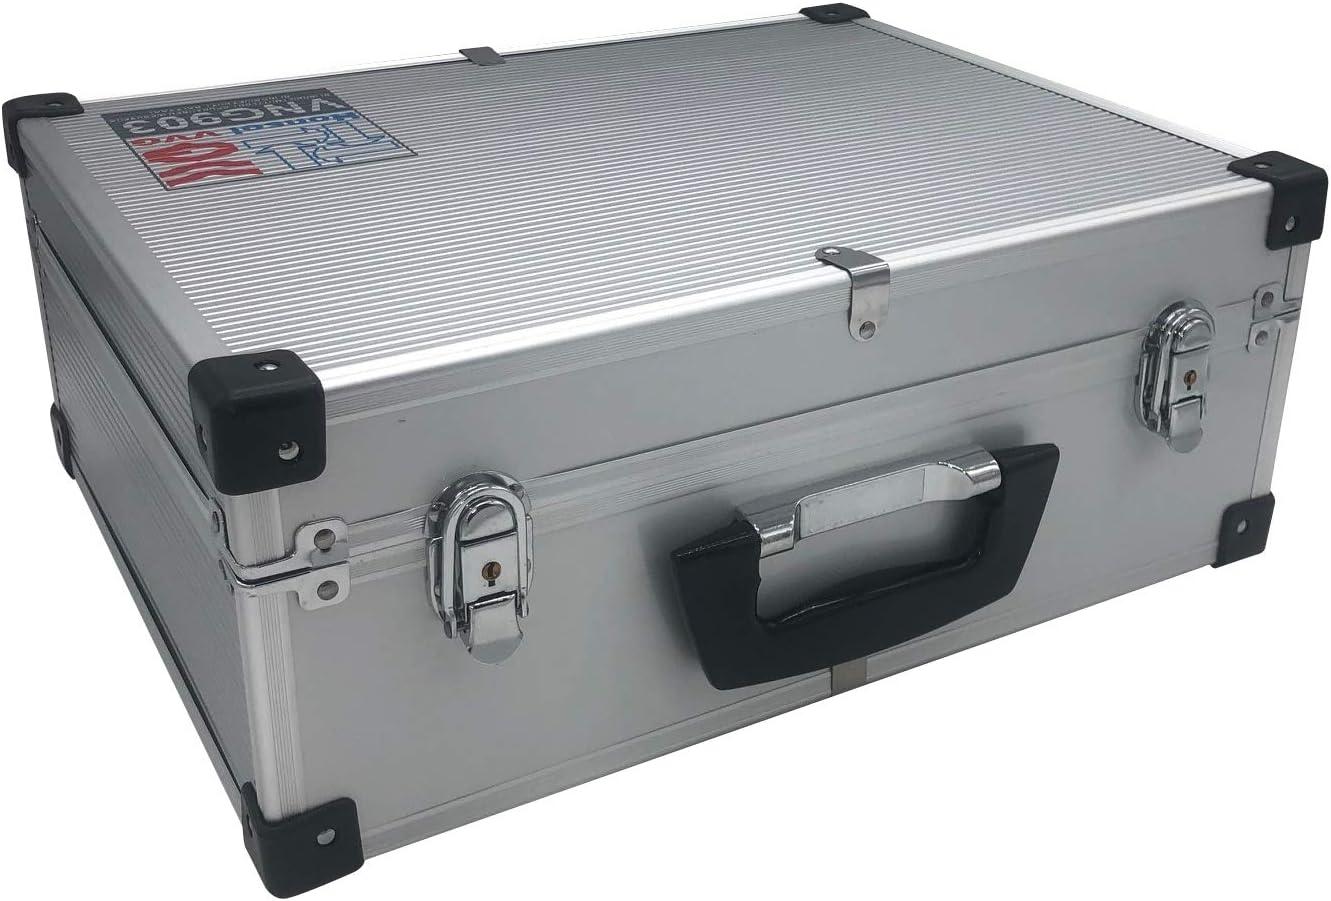 VVG Profi Aluminium Koffer 42,5x16,5x33 cm Schaumstoff Universalkoffer Werkzeugkoffer